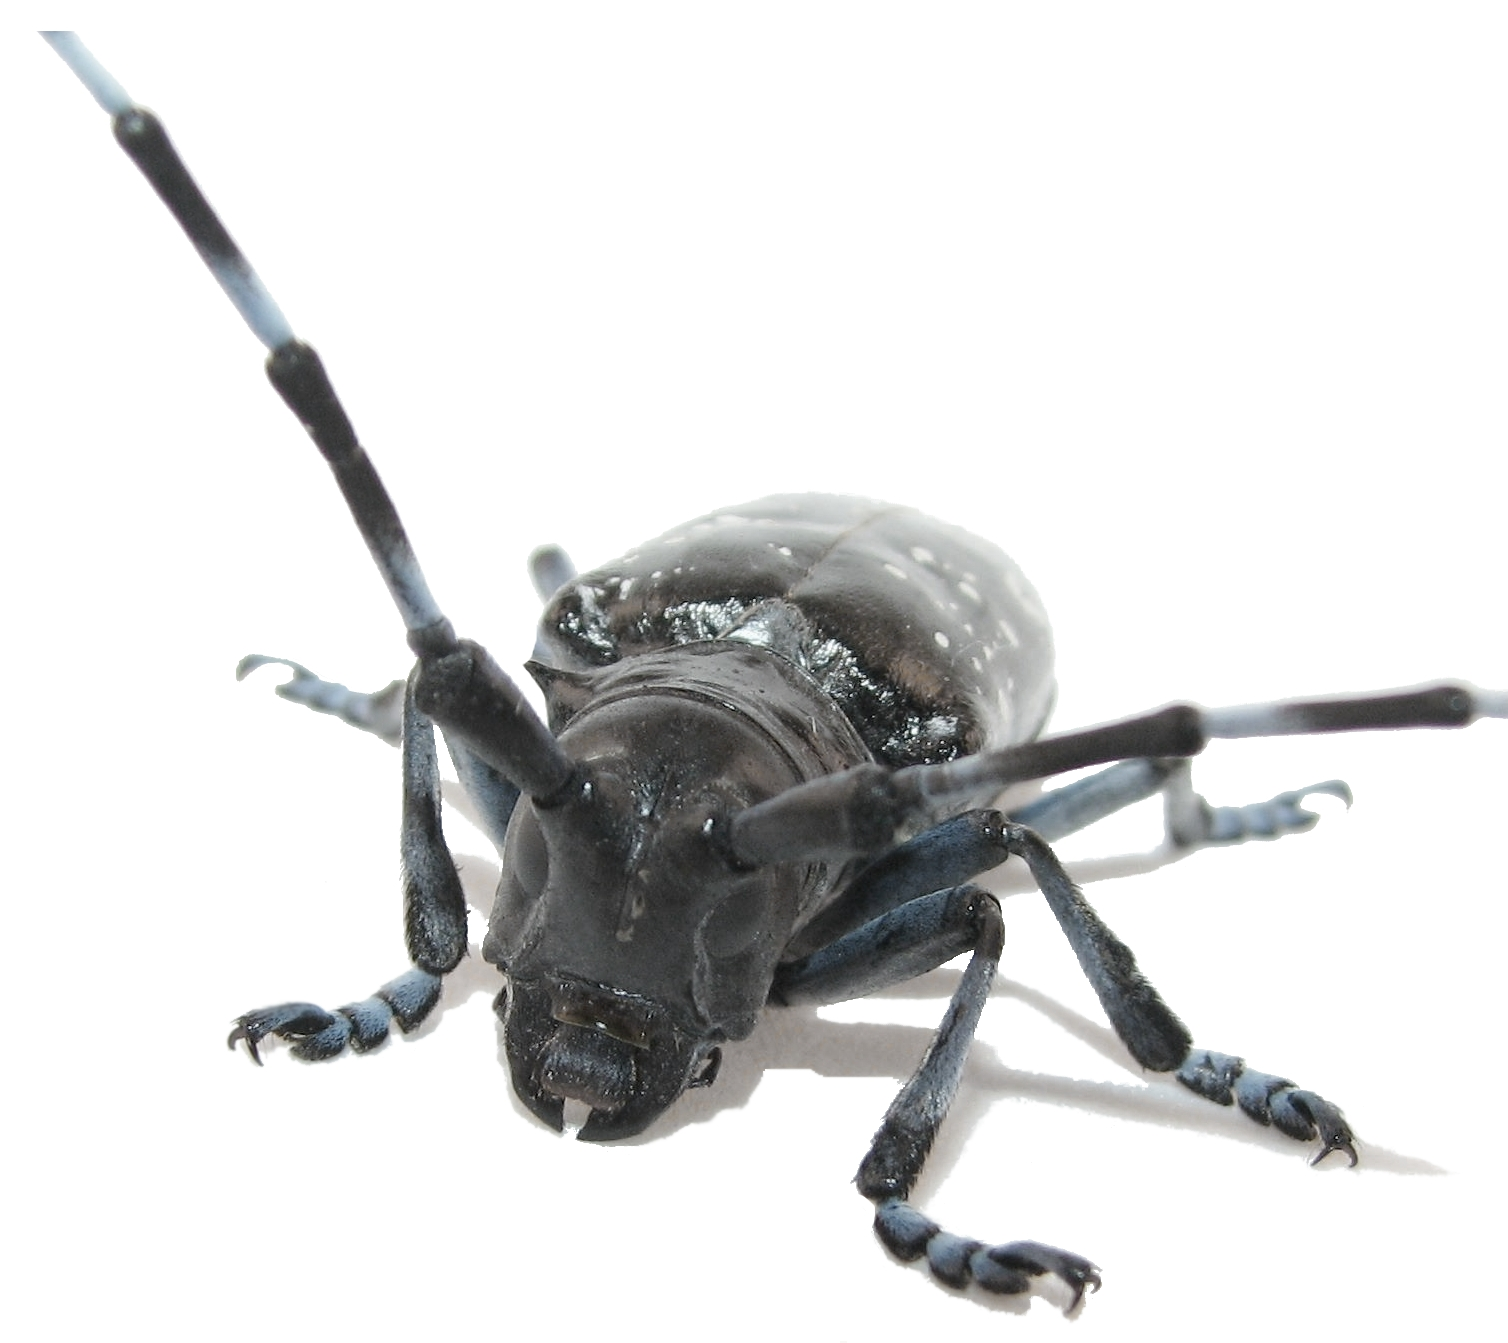 Asian longhorned beetle life cycle